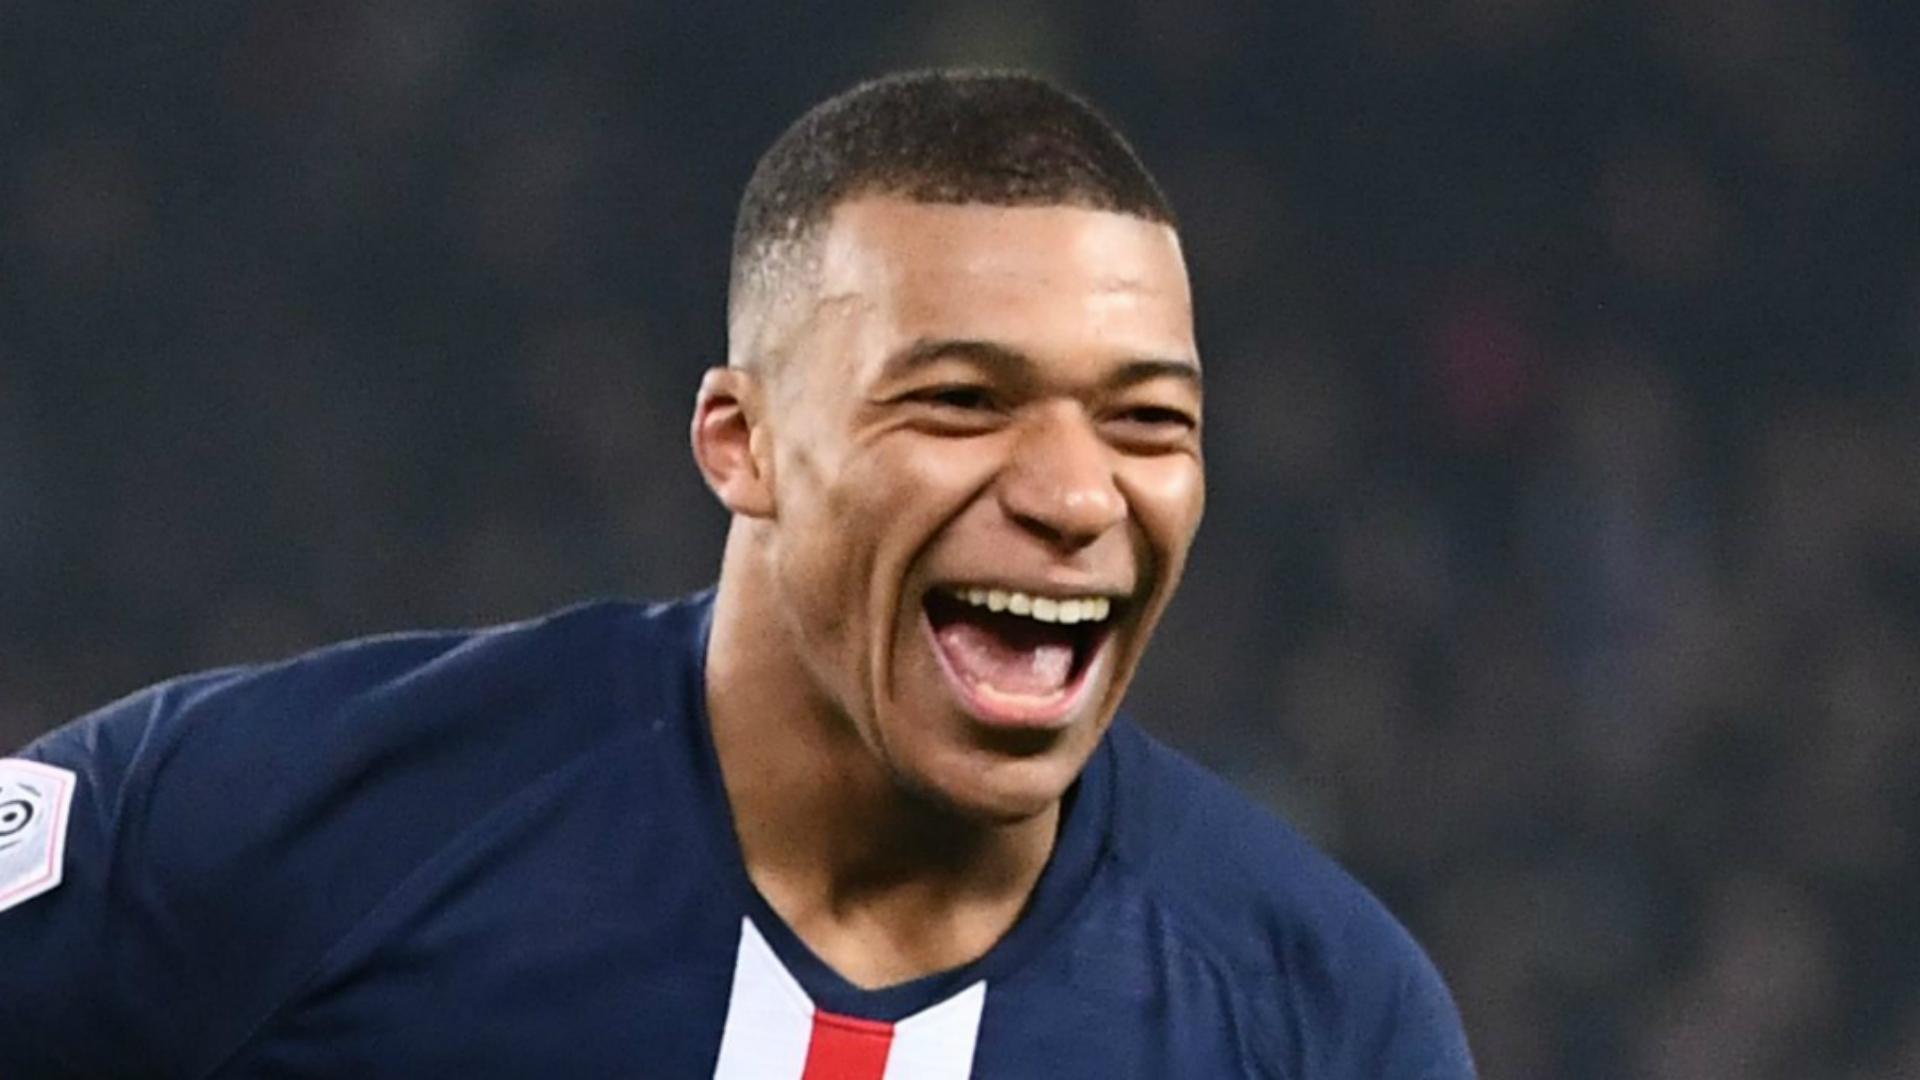 Paris Saint-Germain 2-0 Nantes: Mbappe and Neymar help champions win three in a row